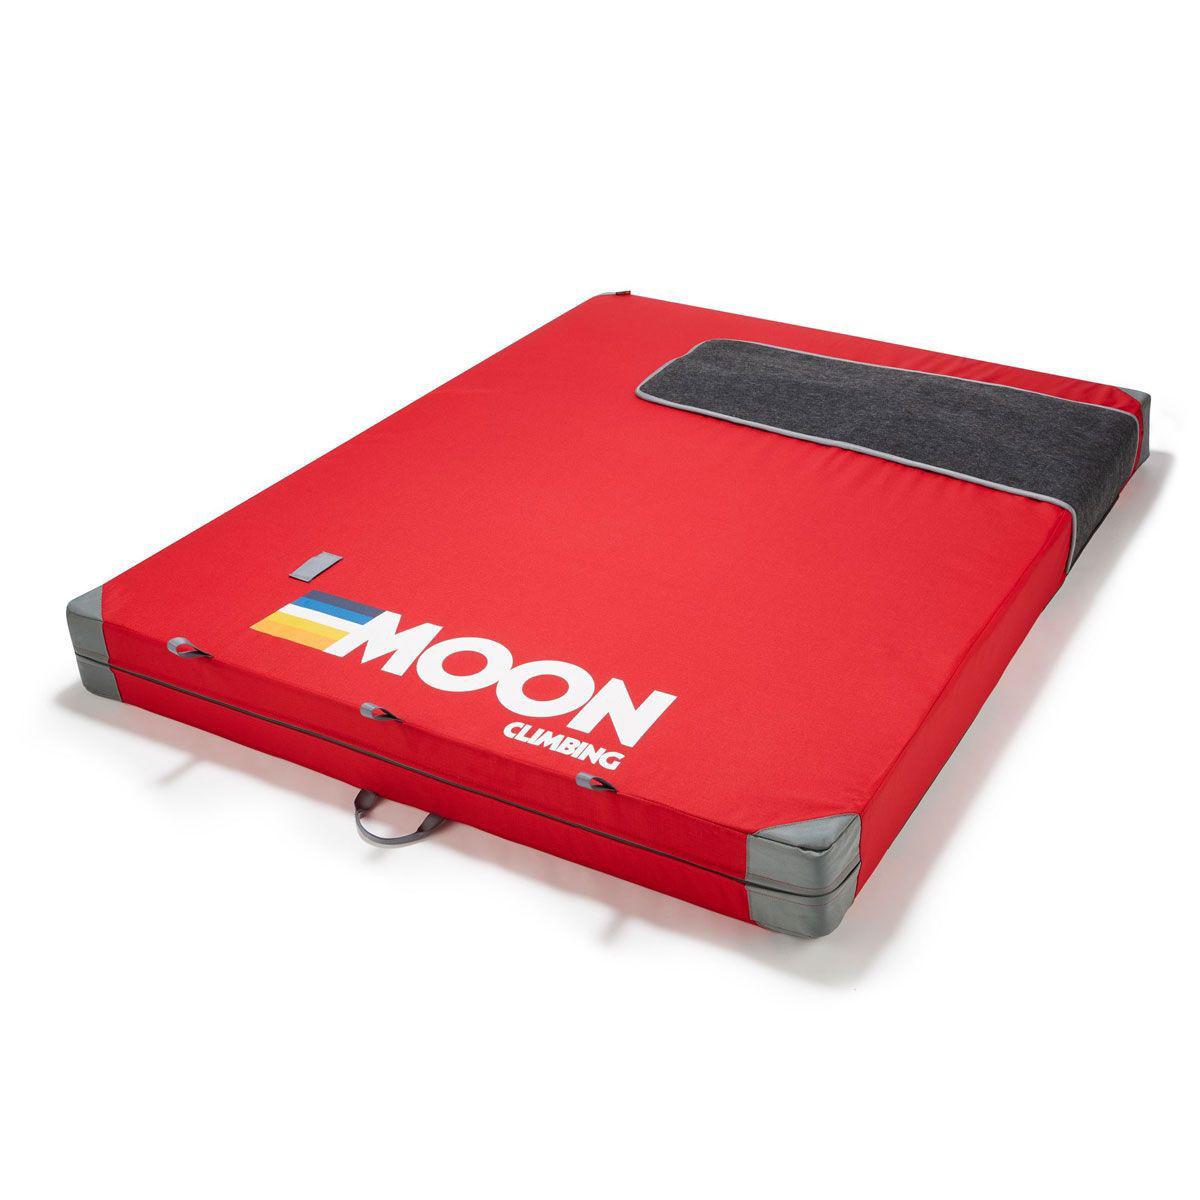 Picture of Moon Saturn Crash Pad